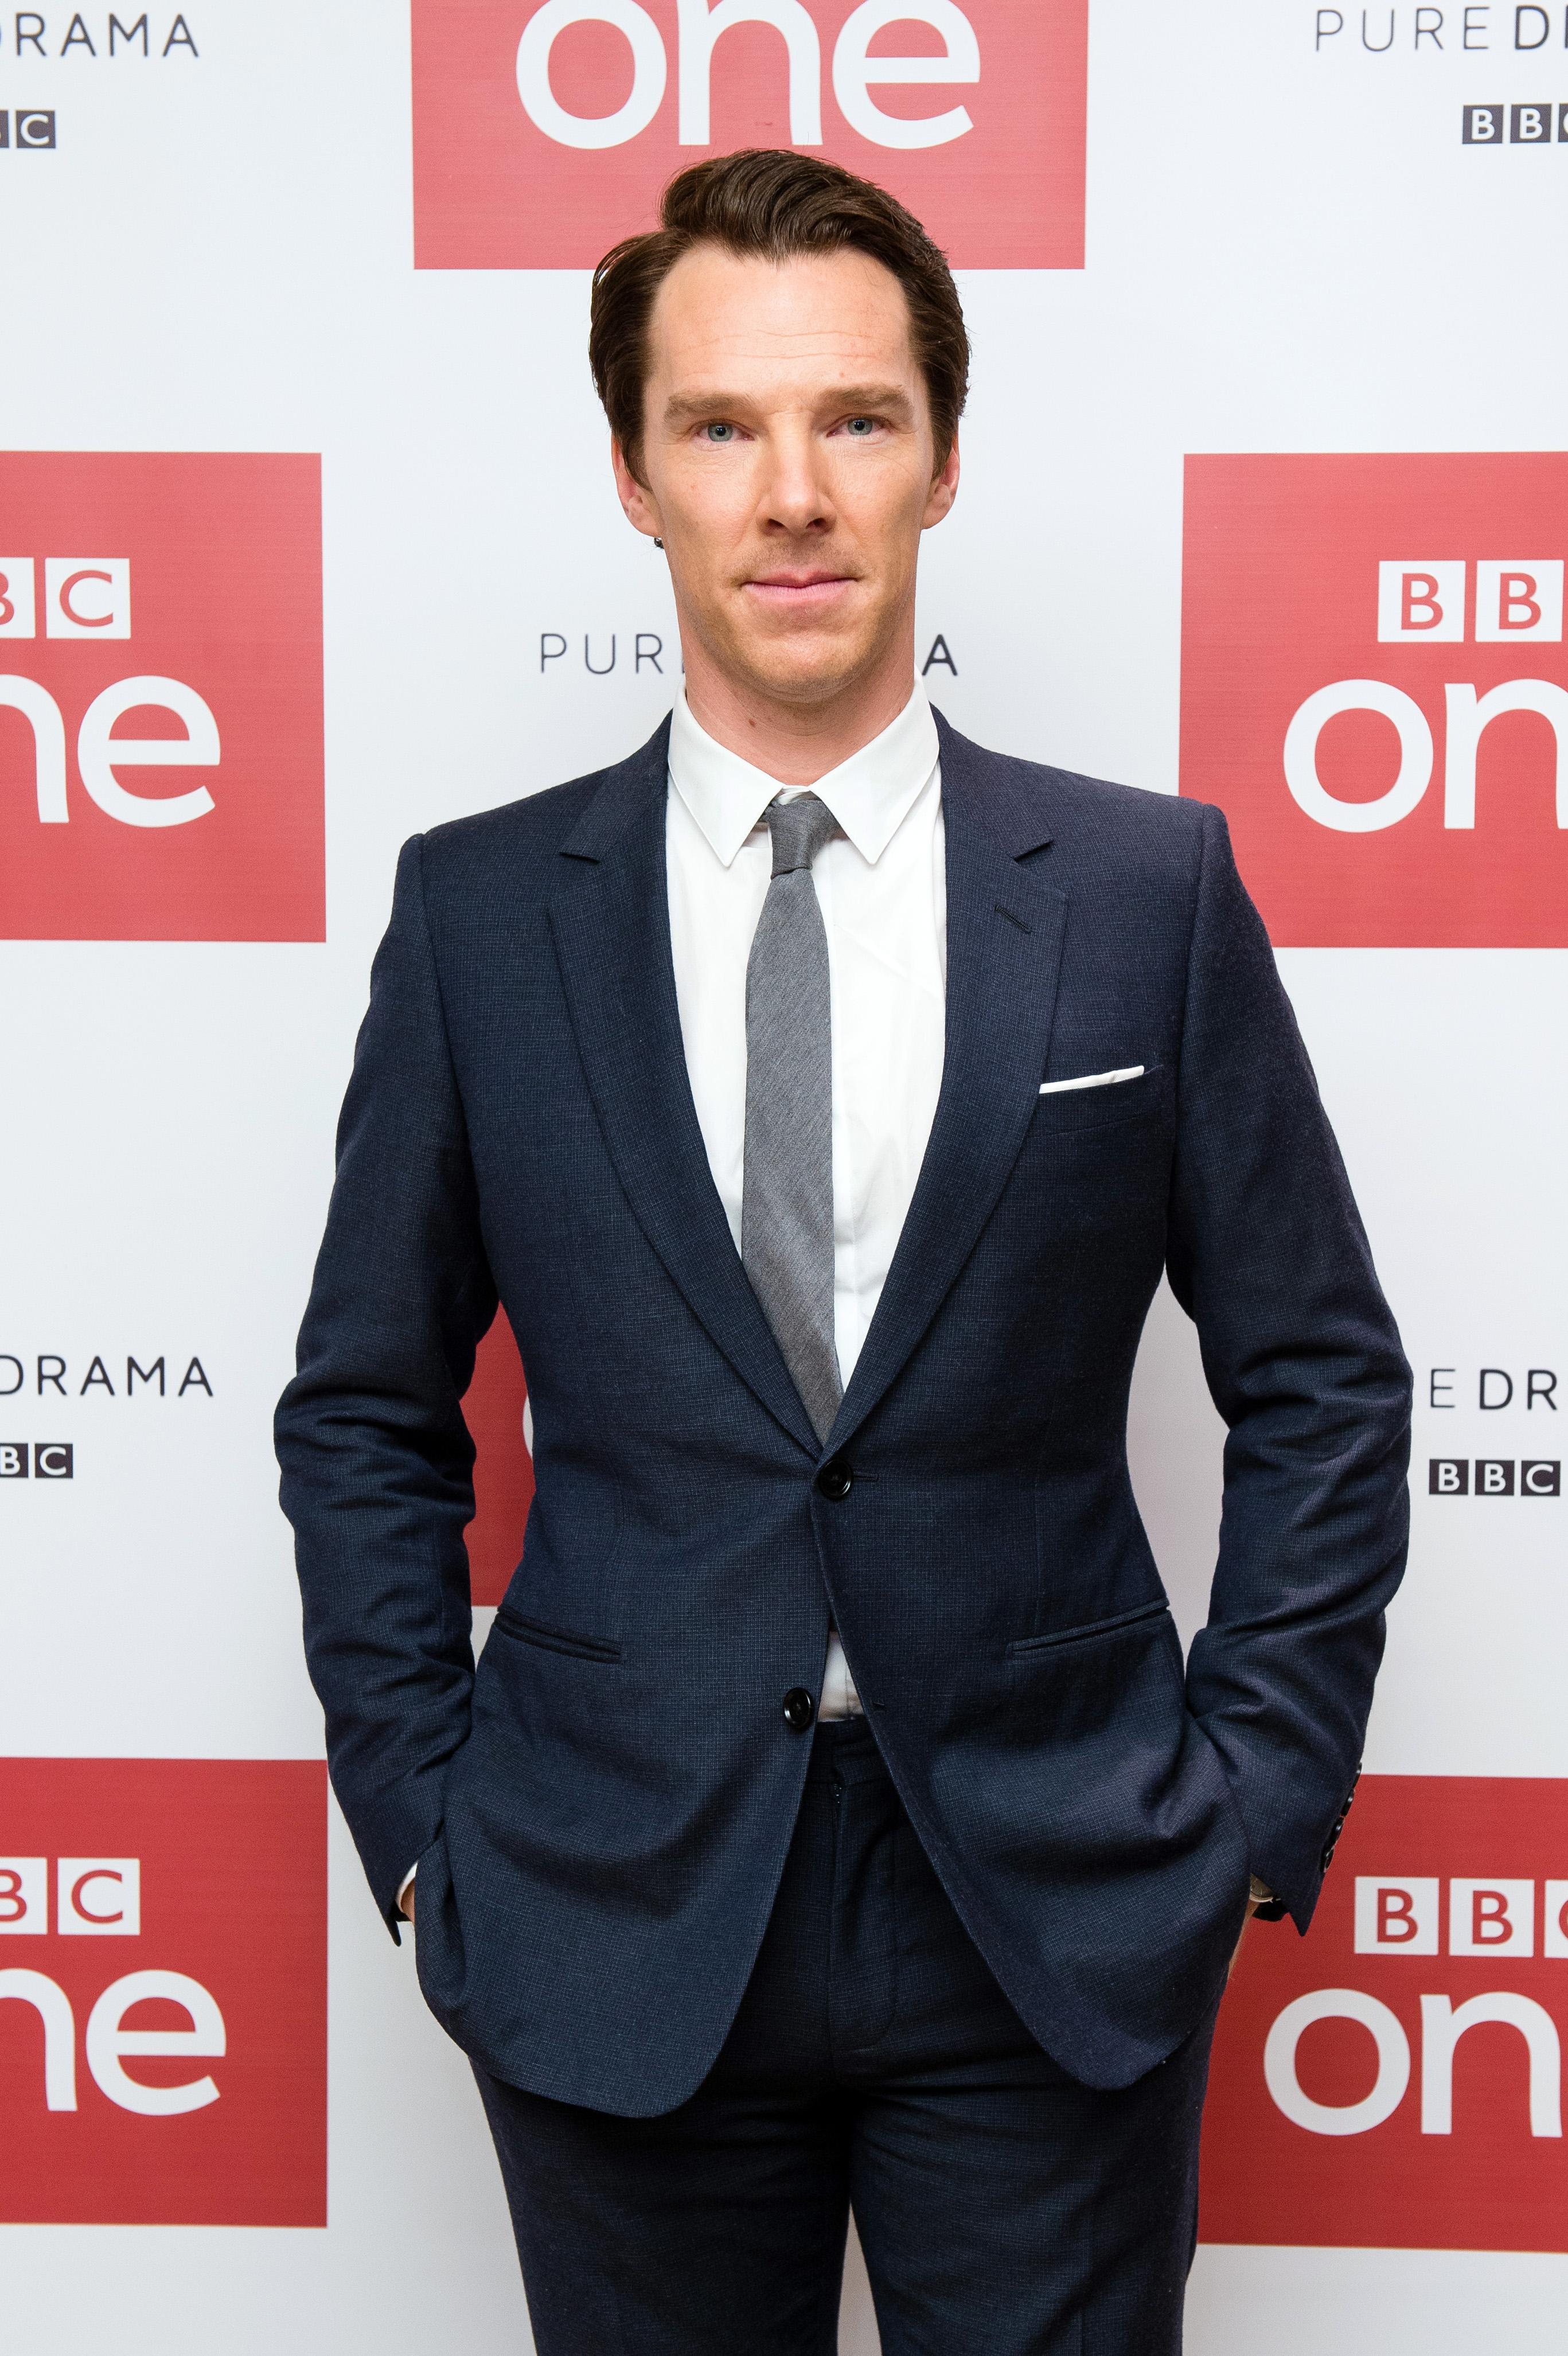 Hot Shots Of Benedict Cumberbatch | Access Online